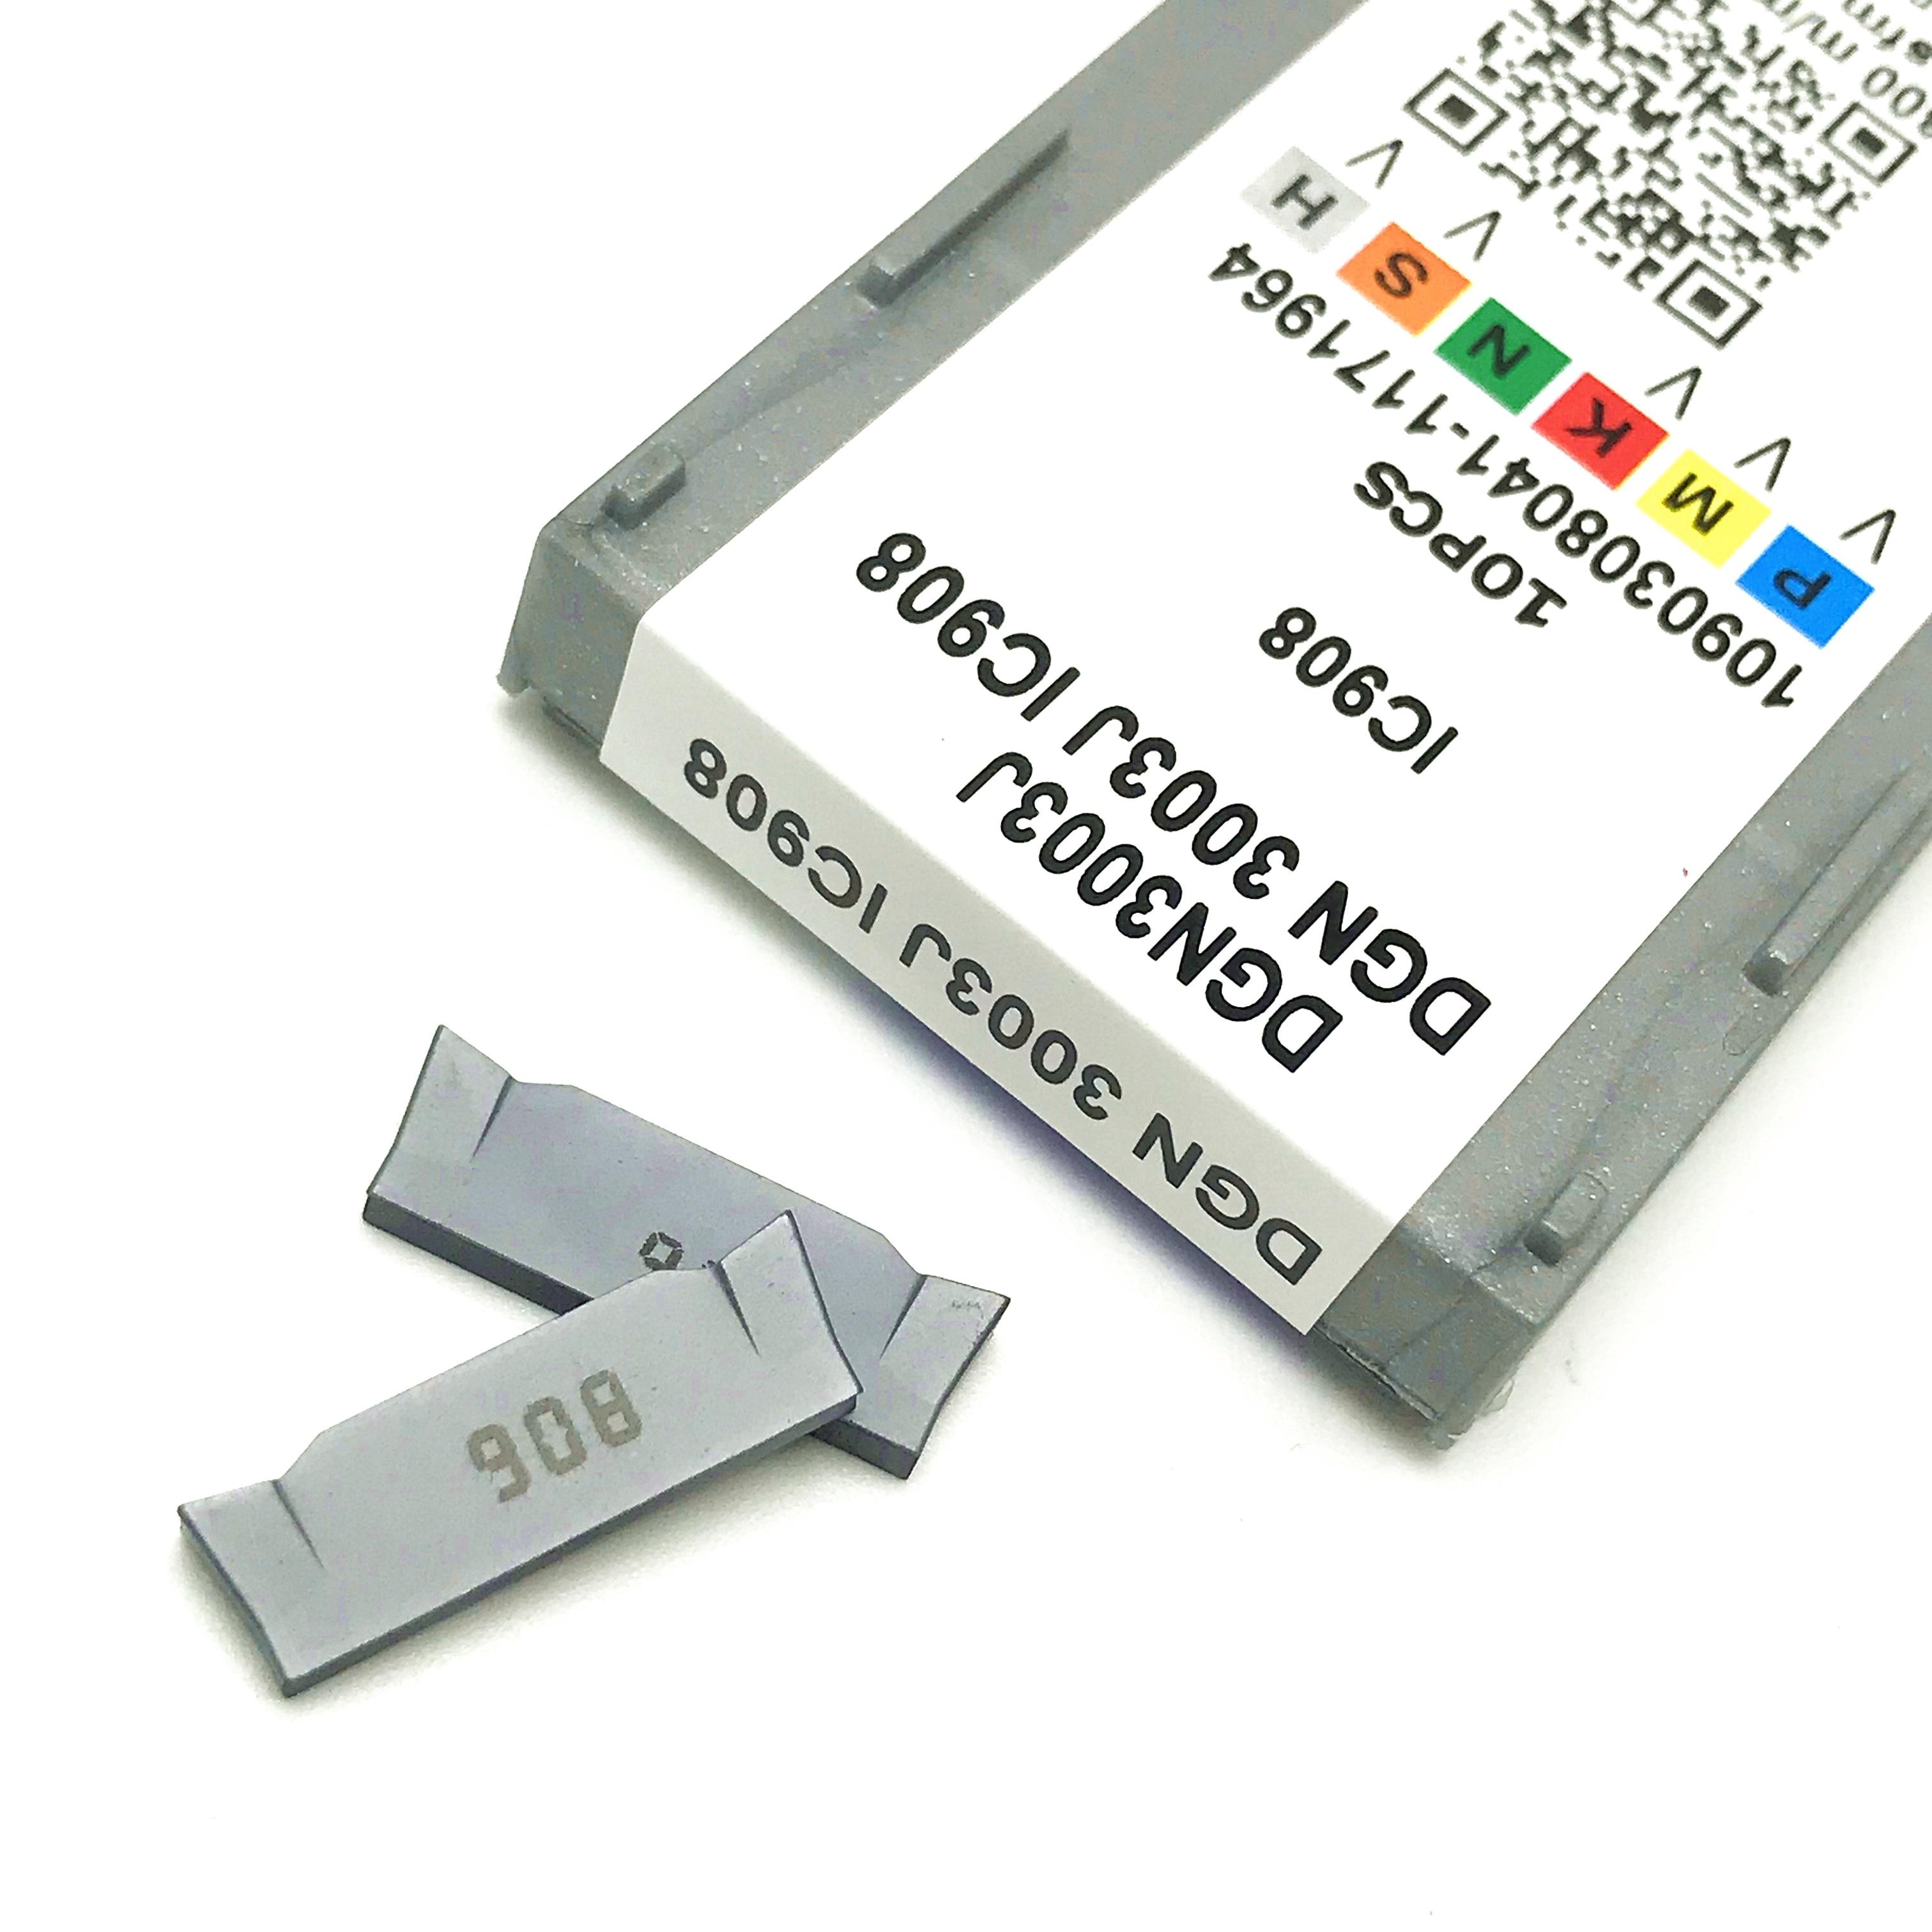 Ferramenta de torno iscr dgn 3003j ic908 3 mm cnc ferramenta para sulco e corte.